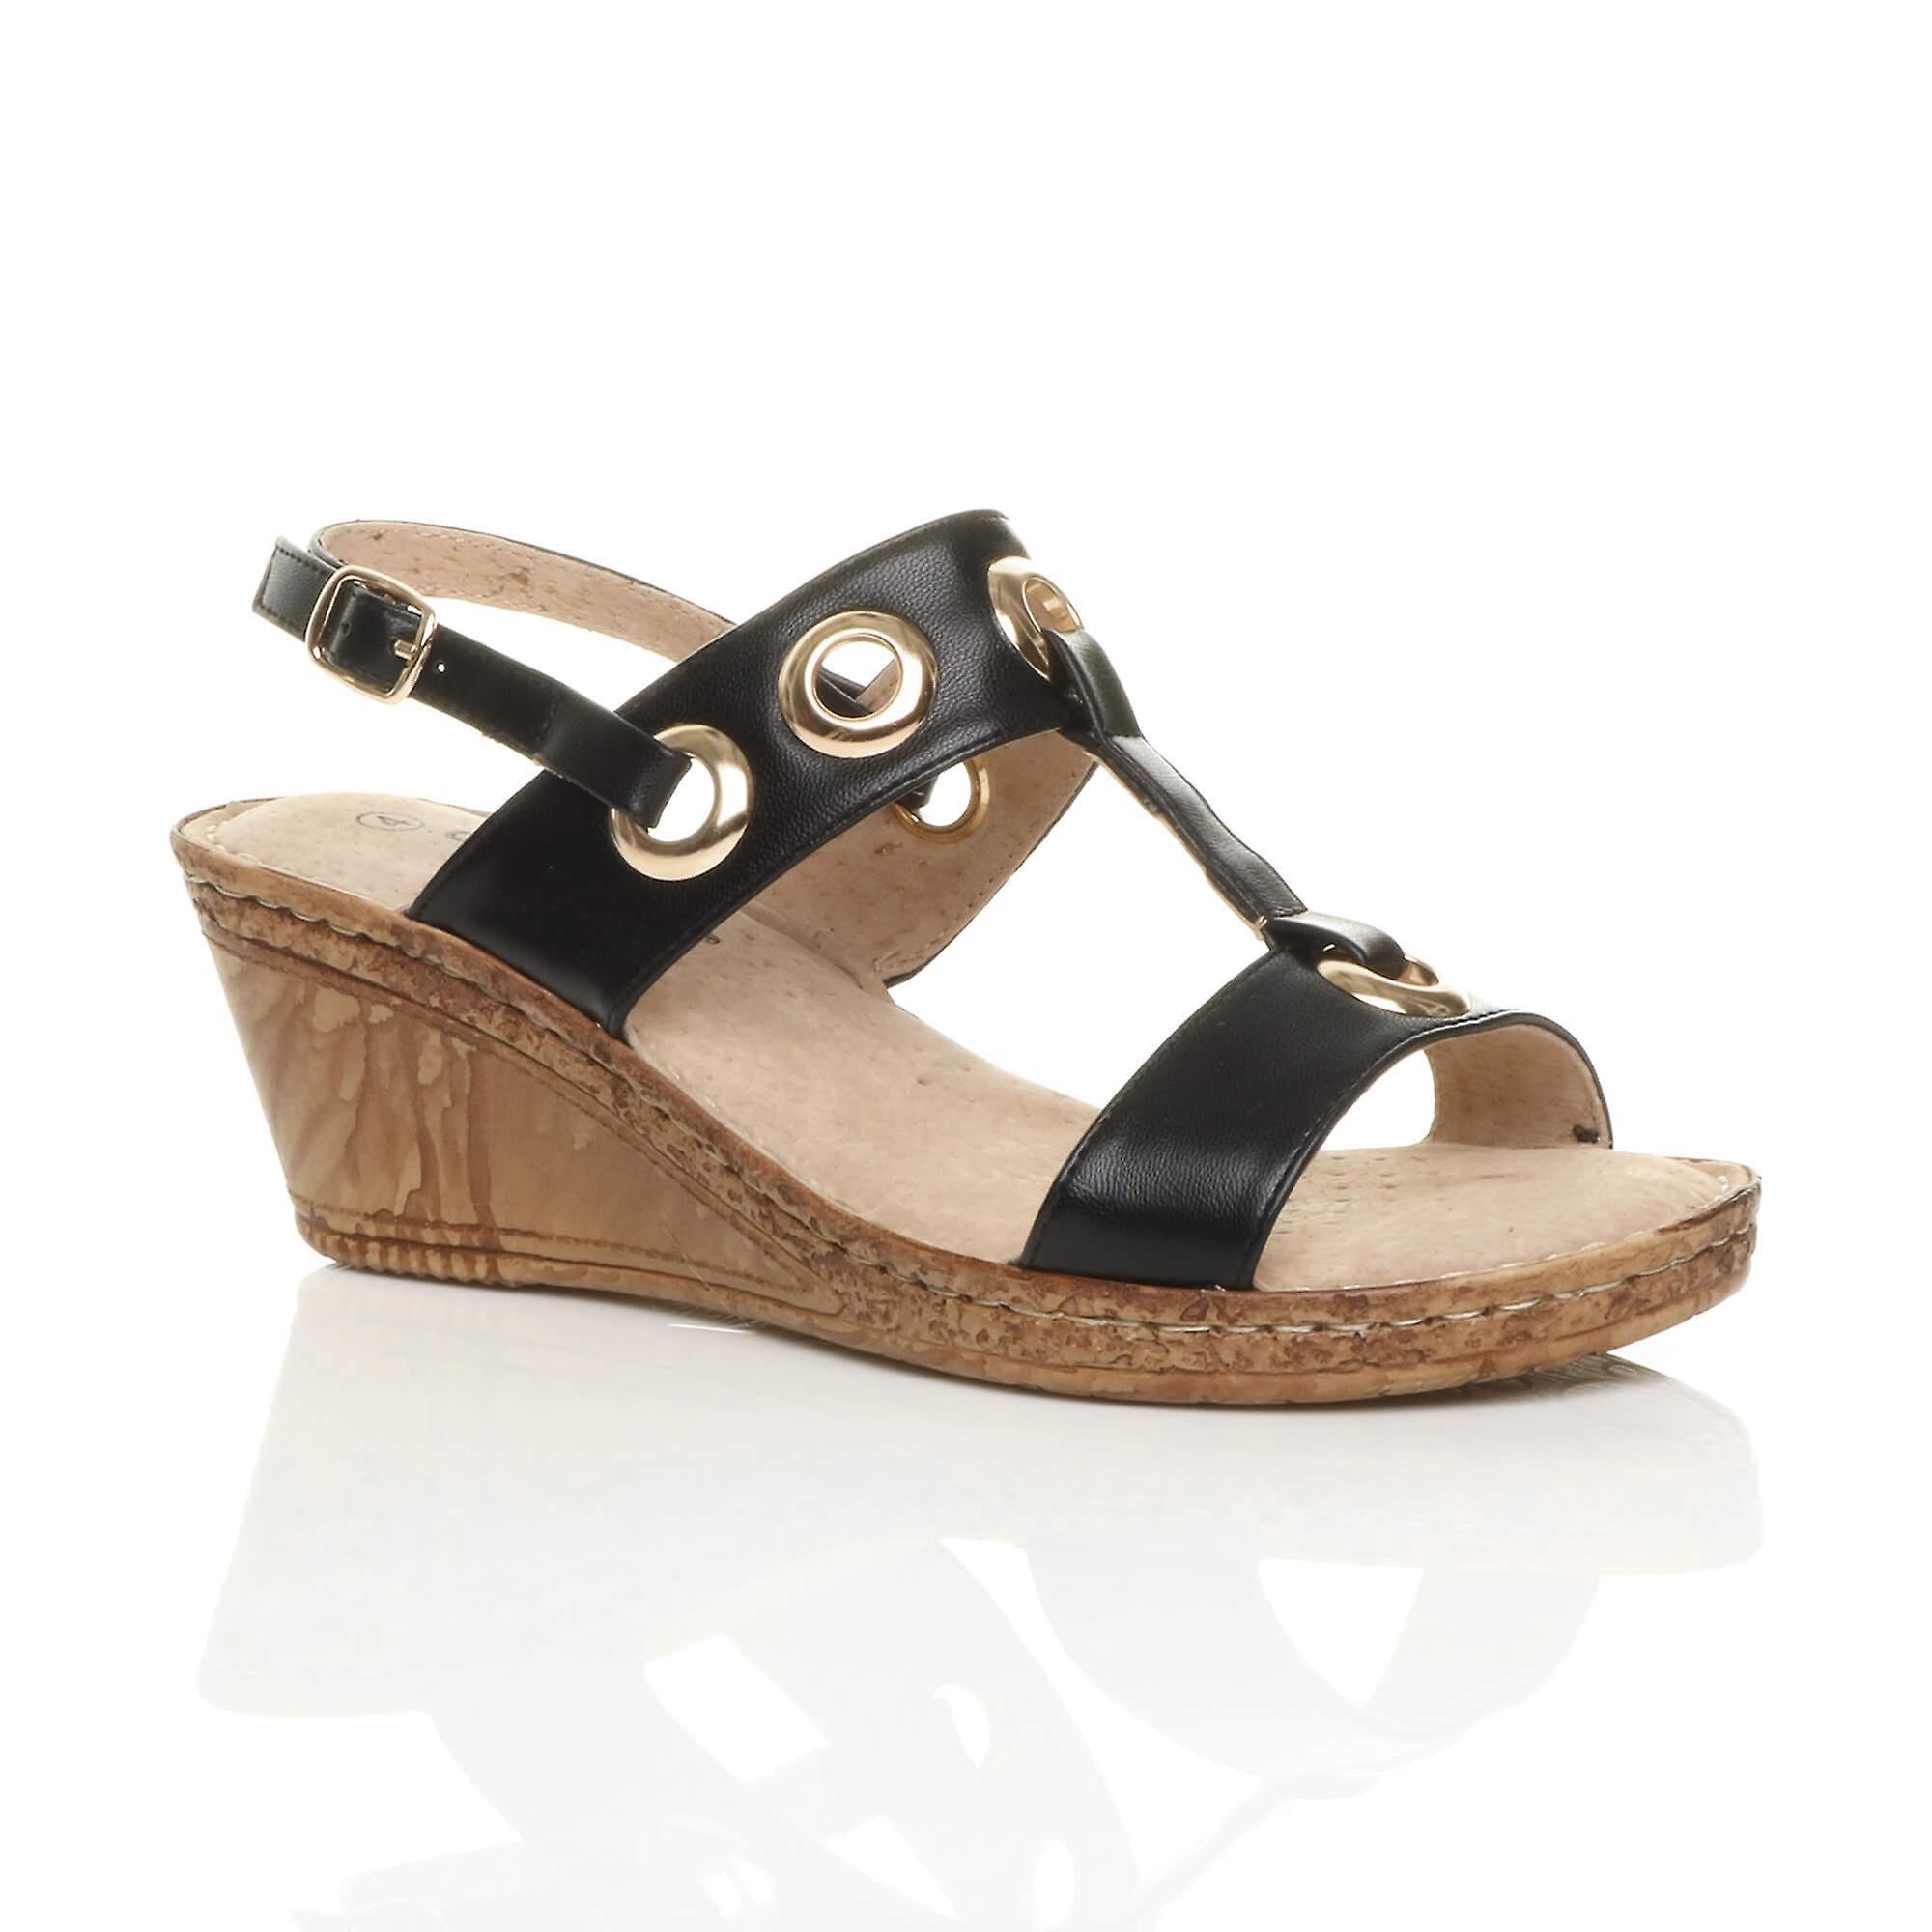 t wedge womens sandals bar heel Ajvani platform comfort mid slingback S1Xfwq